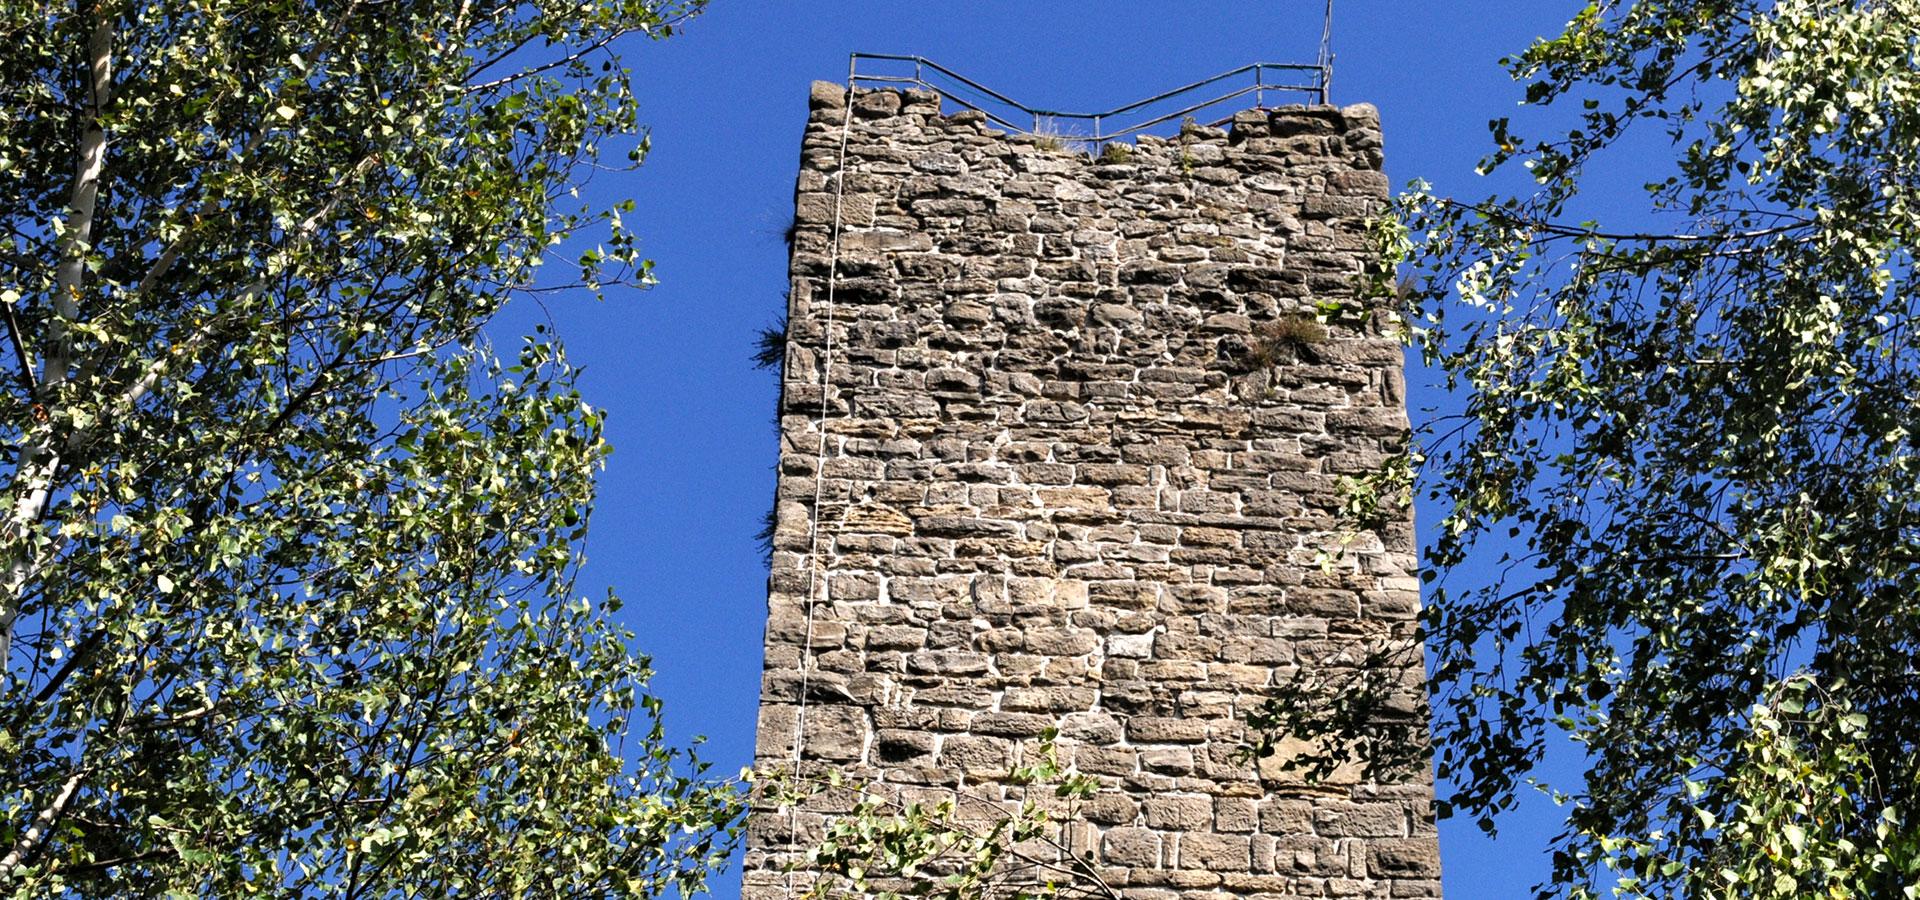 torre-castelnuovo-di-ceva-2